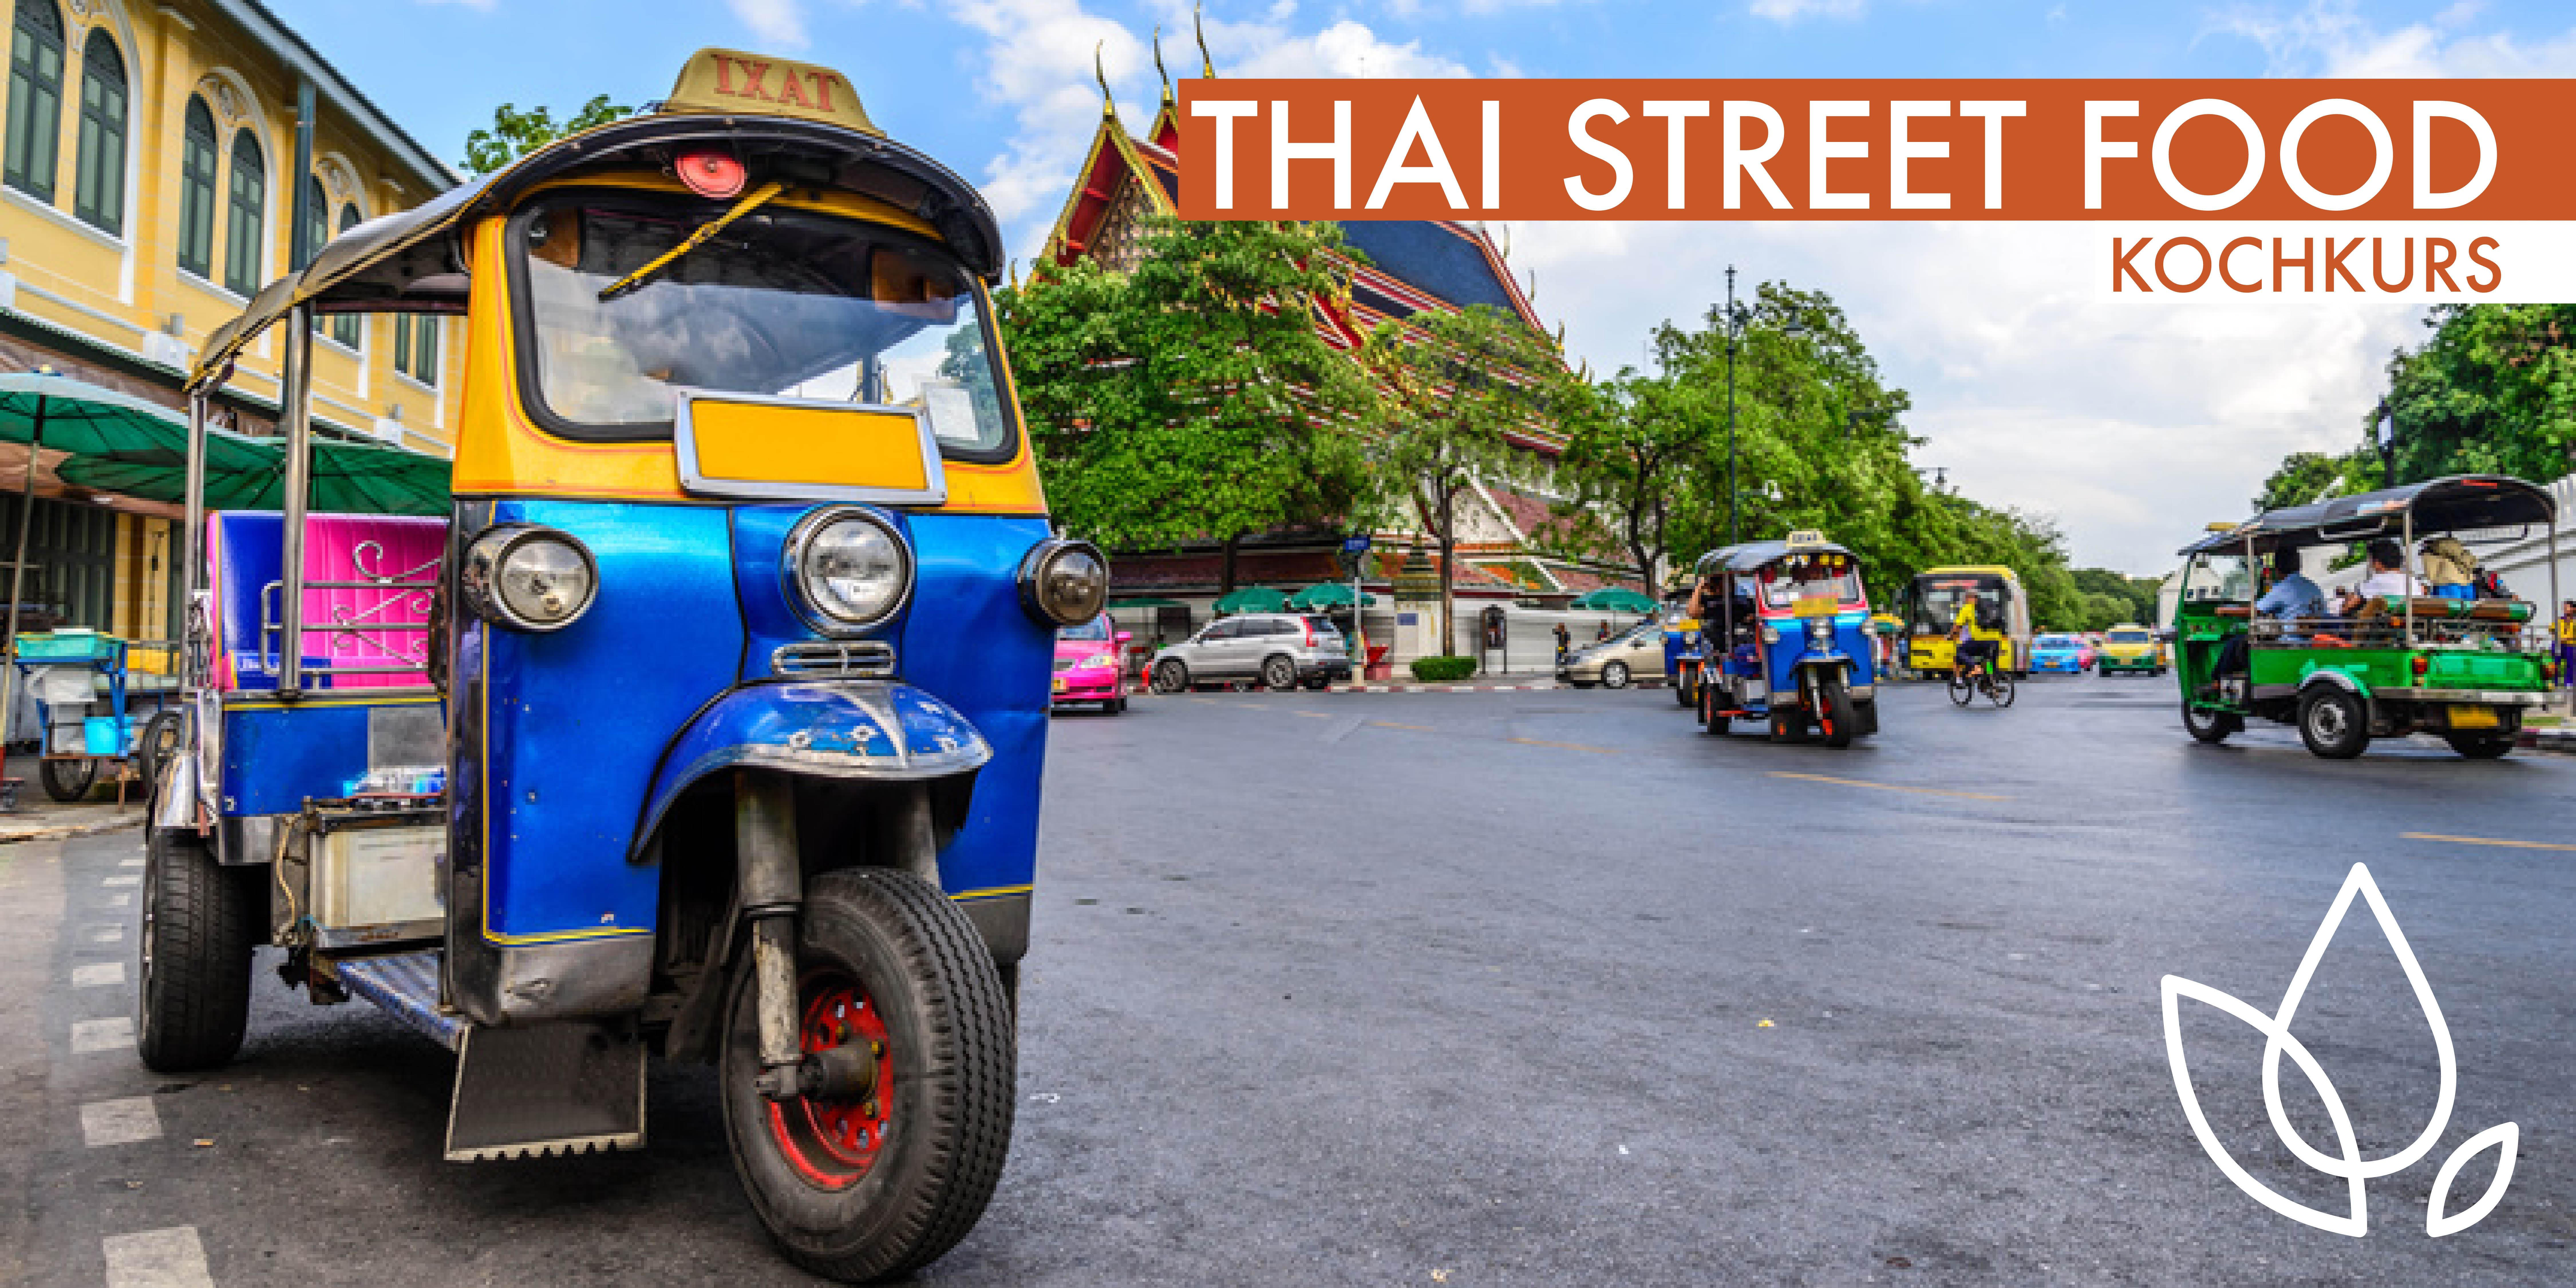 THAI STREET FOOD - KOCHKURS